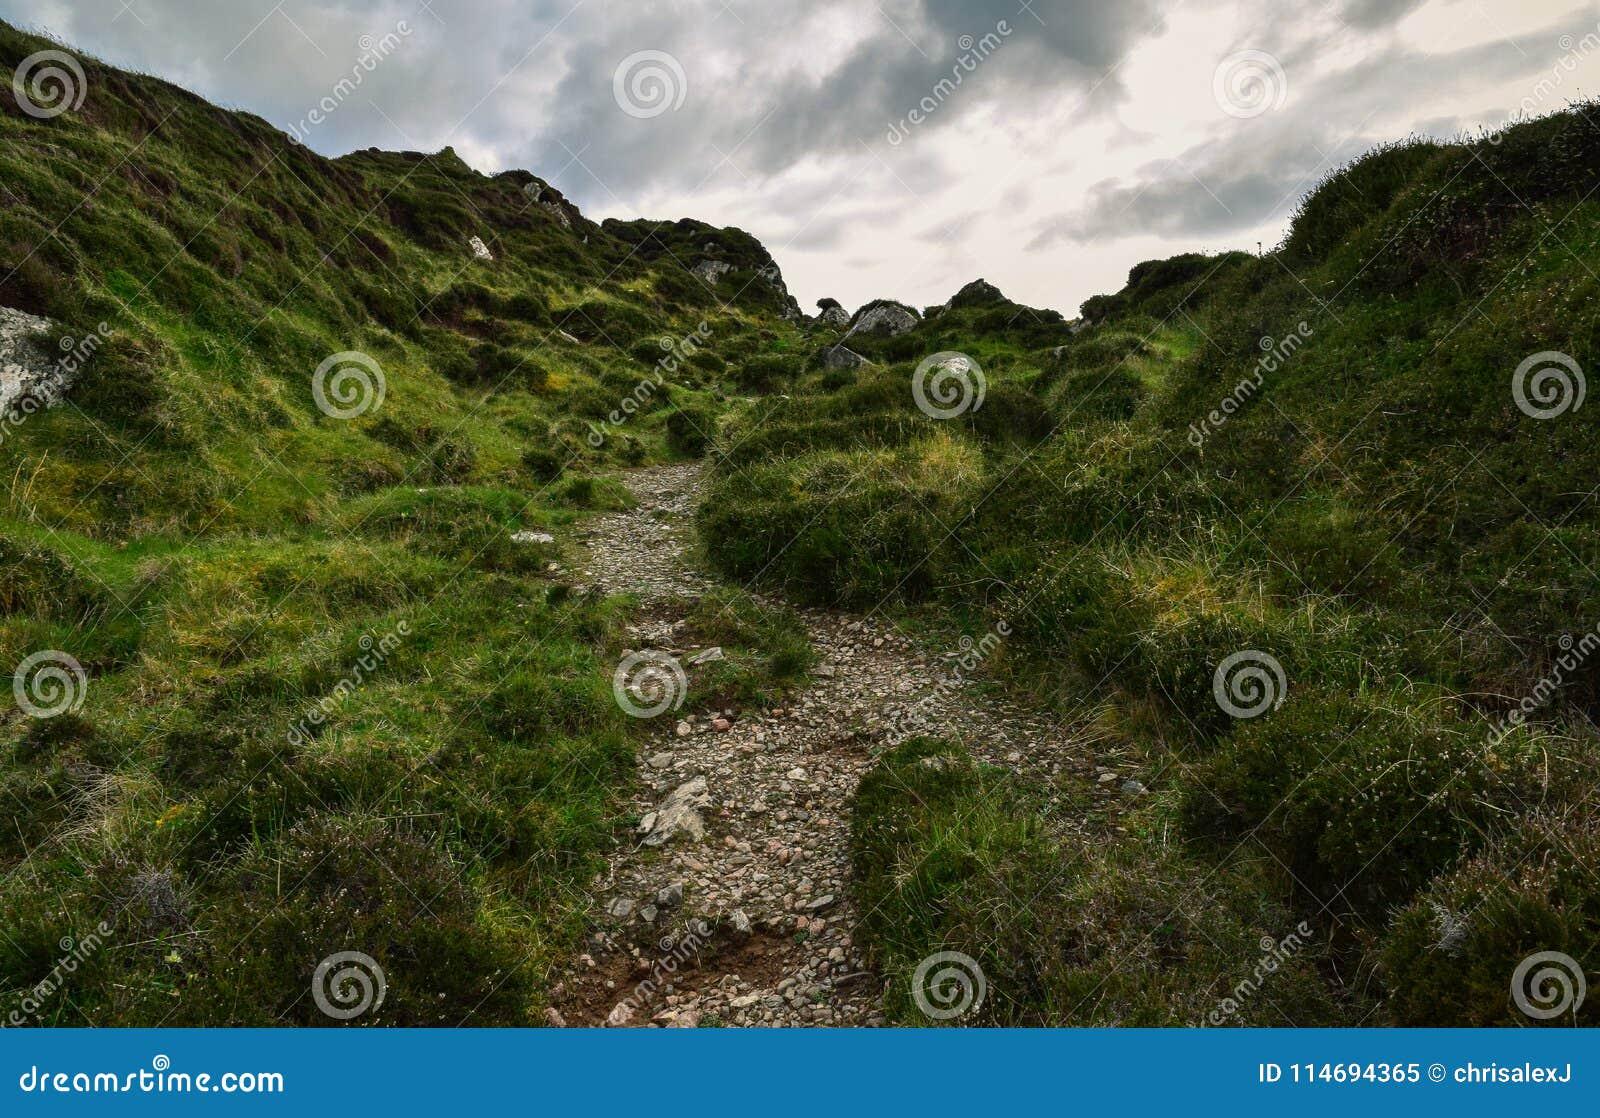 Hiking trail on the Isle of Iona